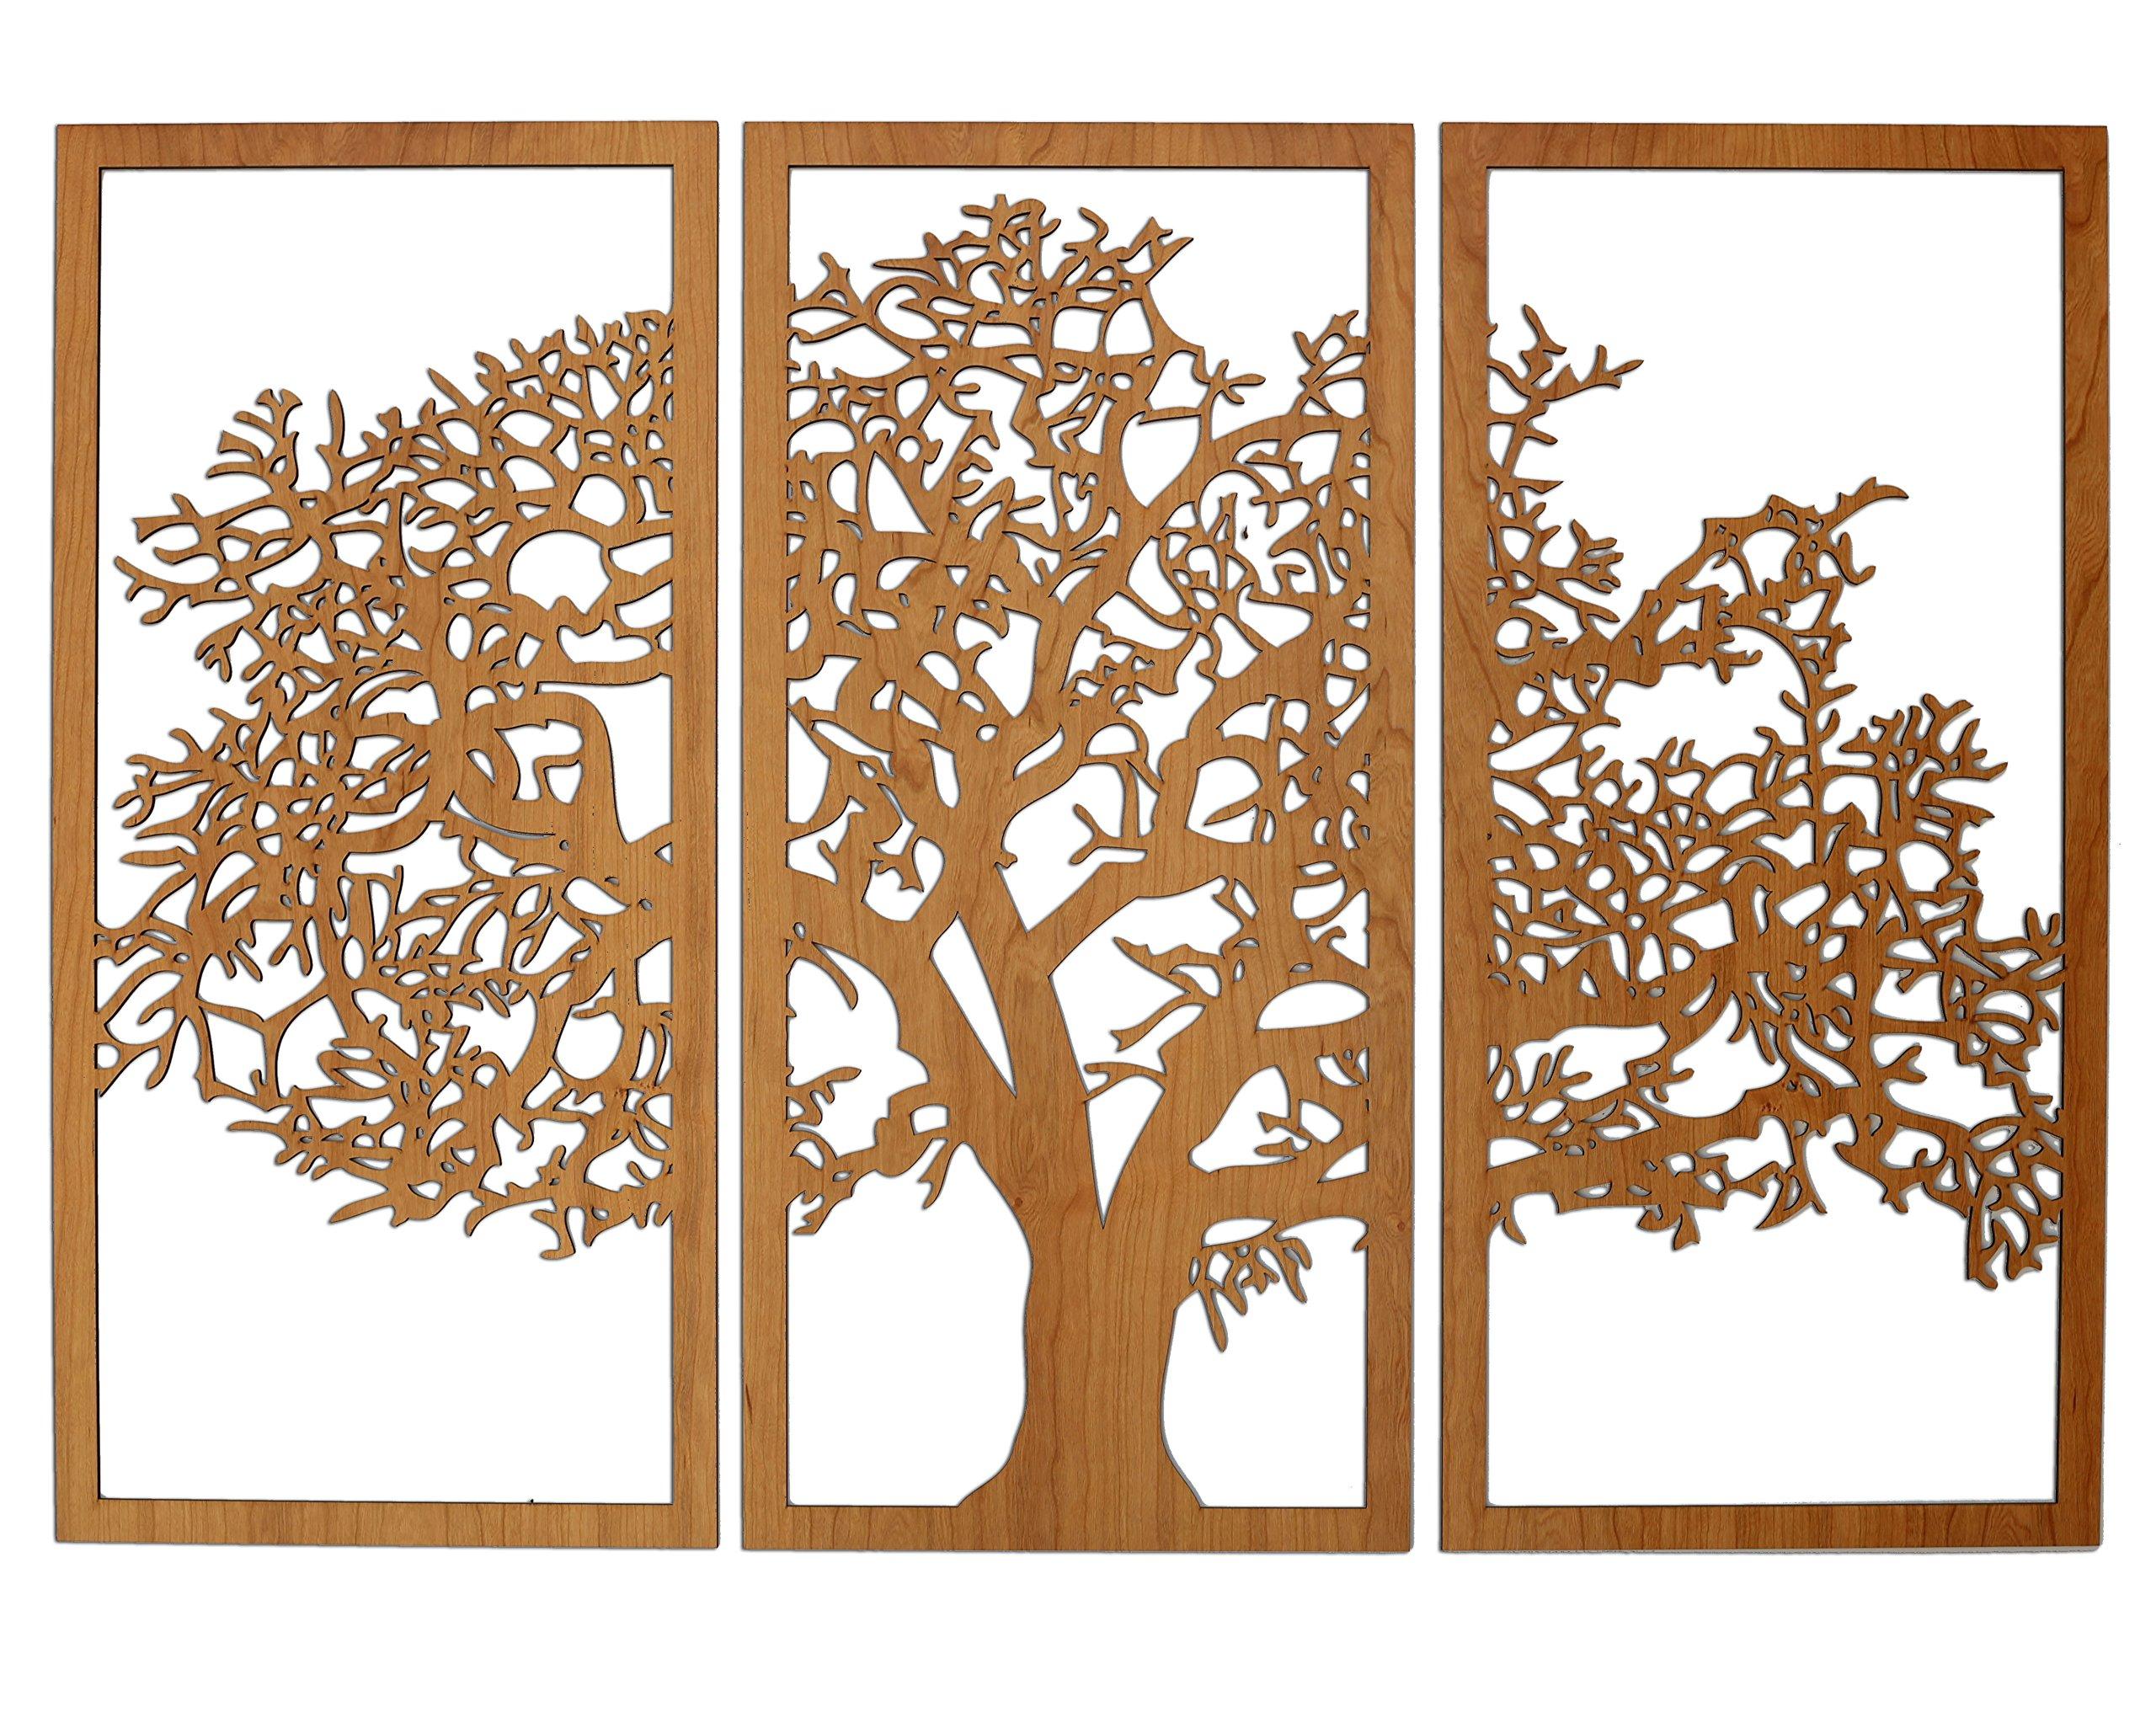 Tree of Life 3D Cherry - 3 Panel Wood Wall Art - Beautiful Living Room Decor - Skyline Workshop